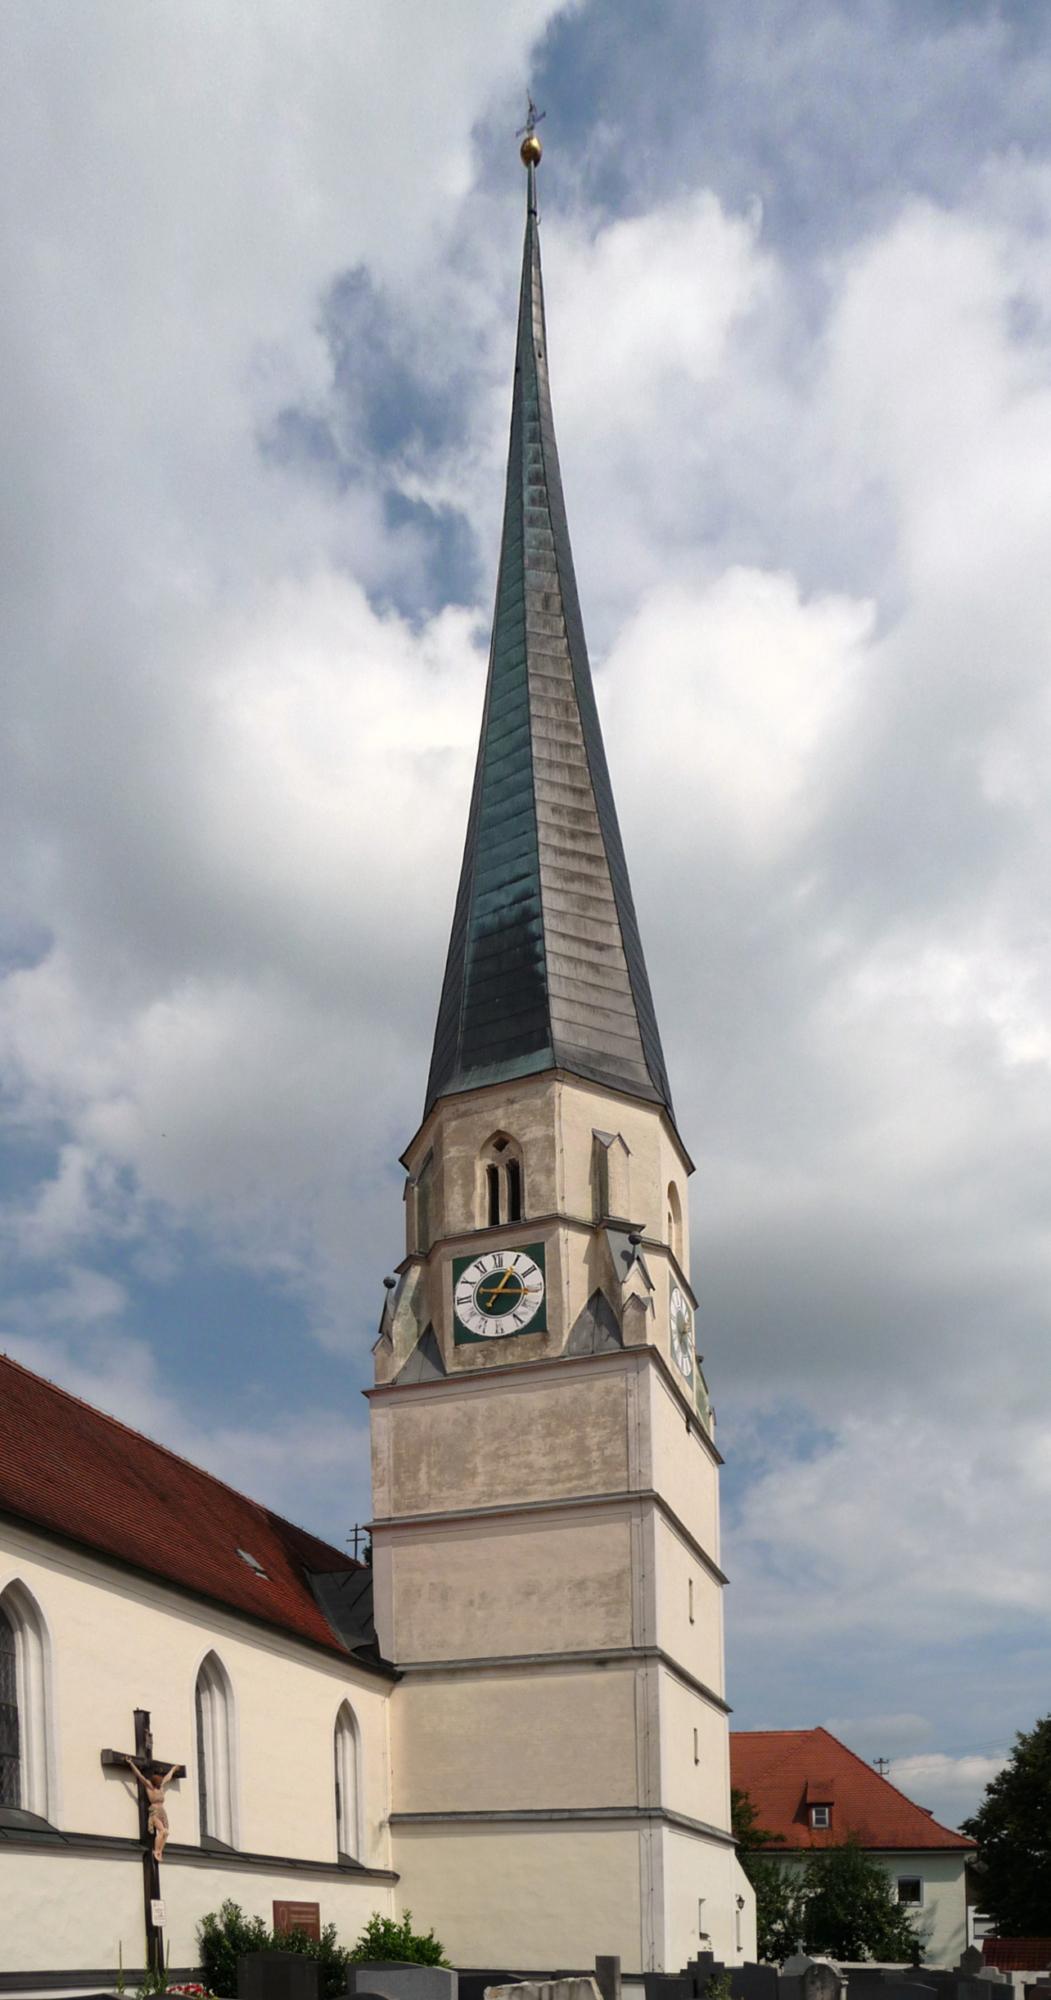 Pfarrkirche Rogglfing 2